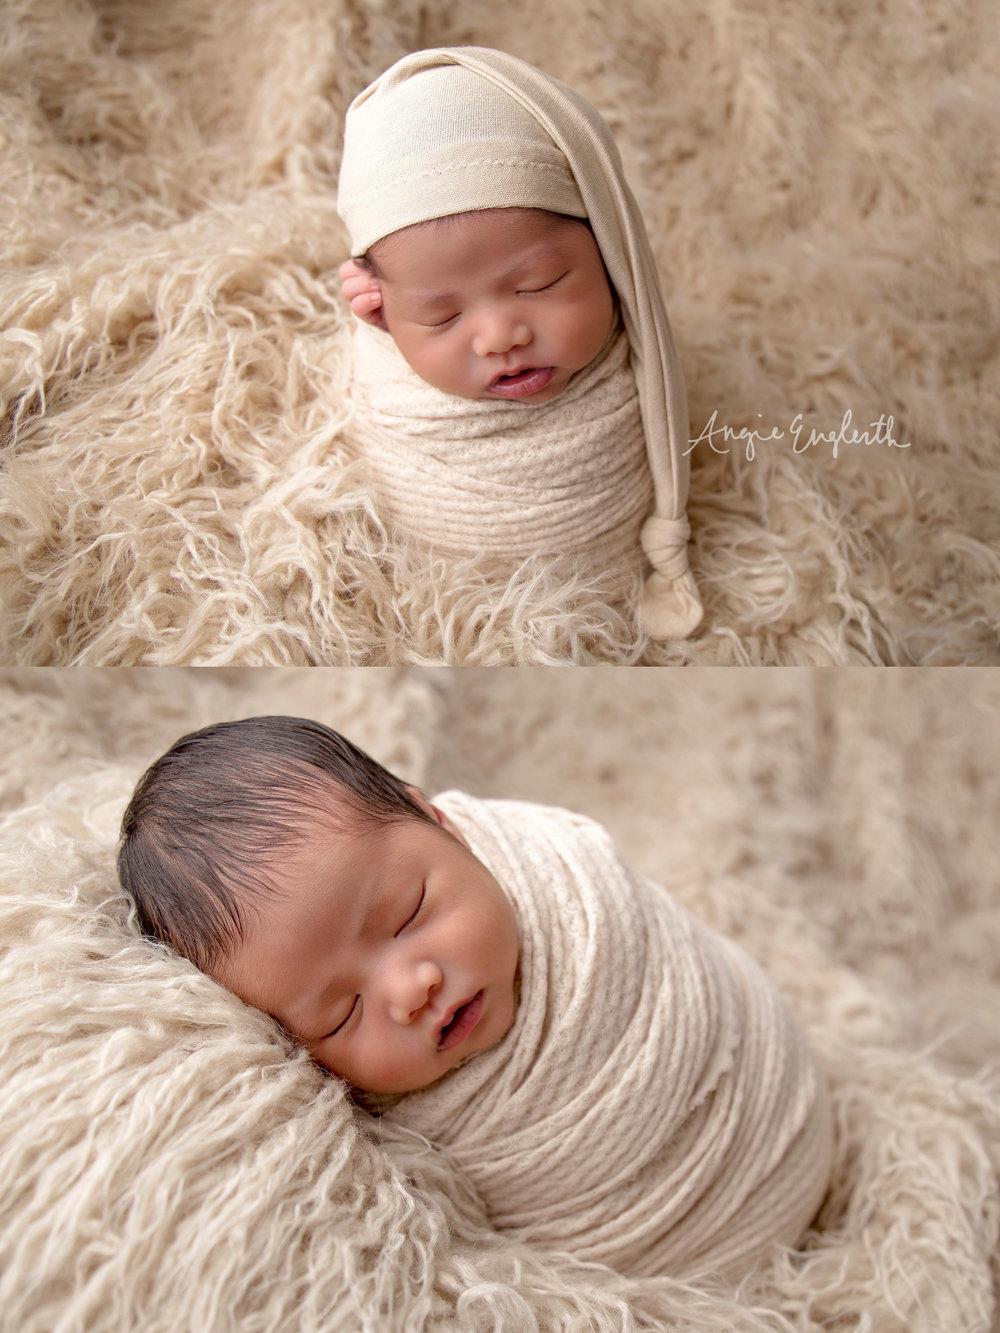 AngieEnglerthPhotography_Lancaster_Newborn_Photographer_012.jpg